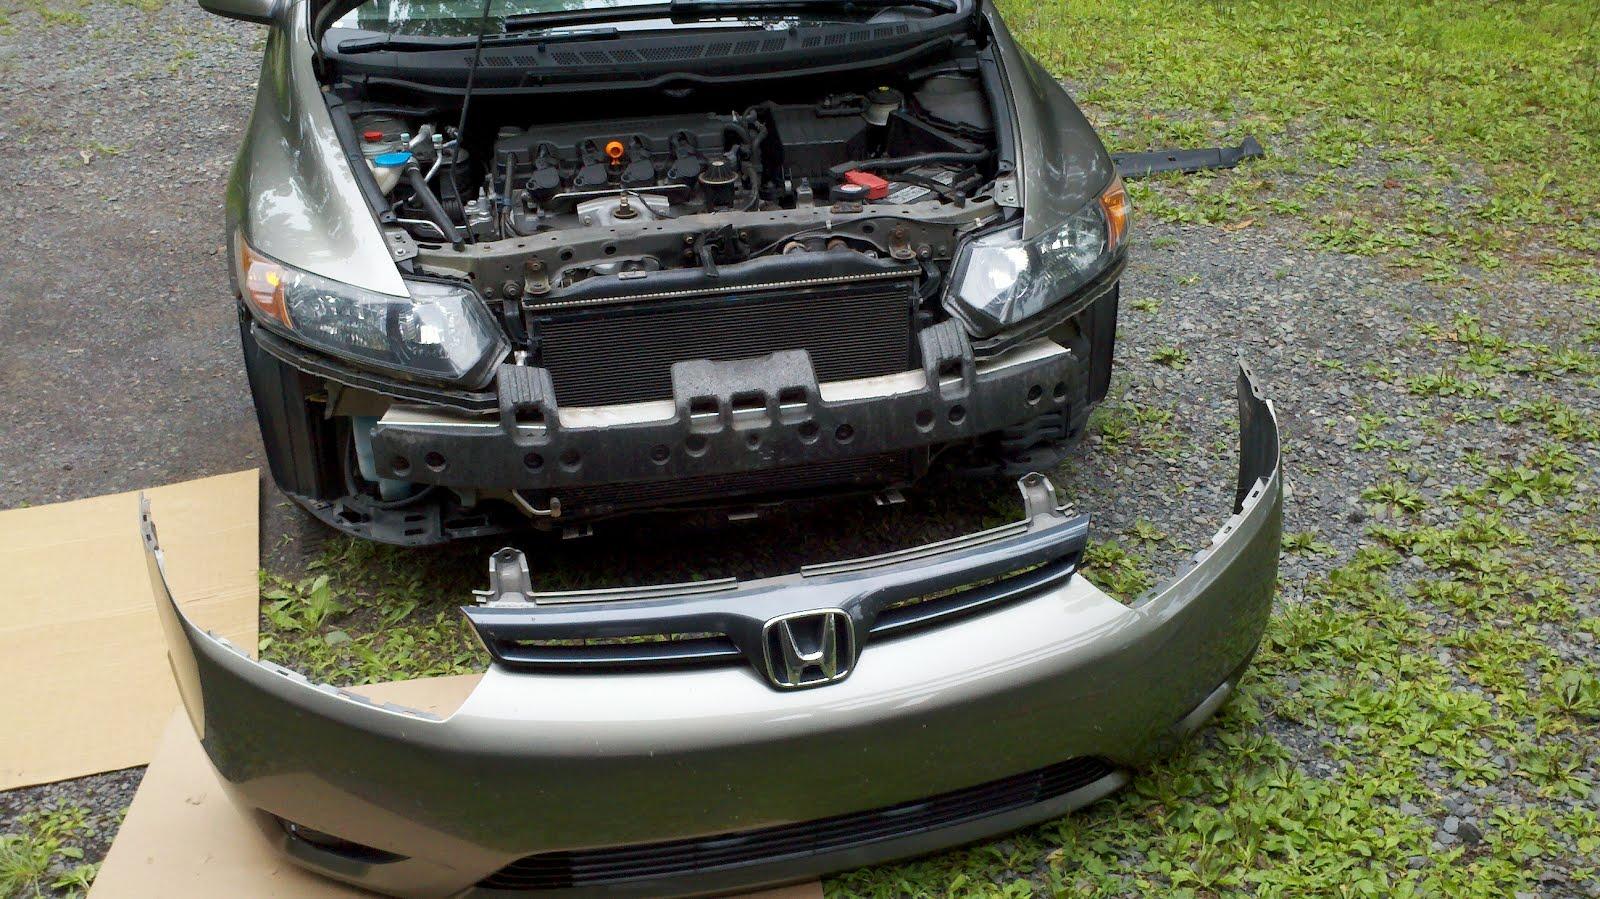 2006 Honda Civic Fog Light Install Cf Customs How To Hook Up Lights